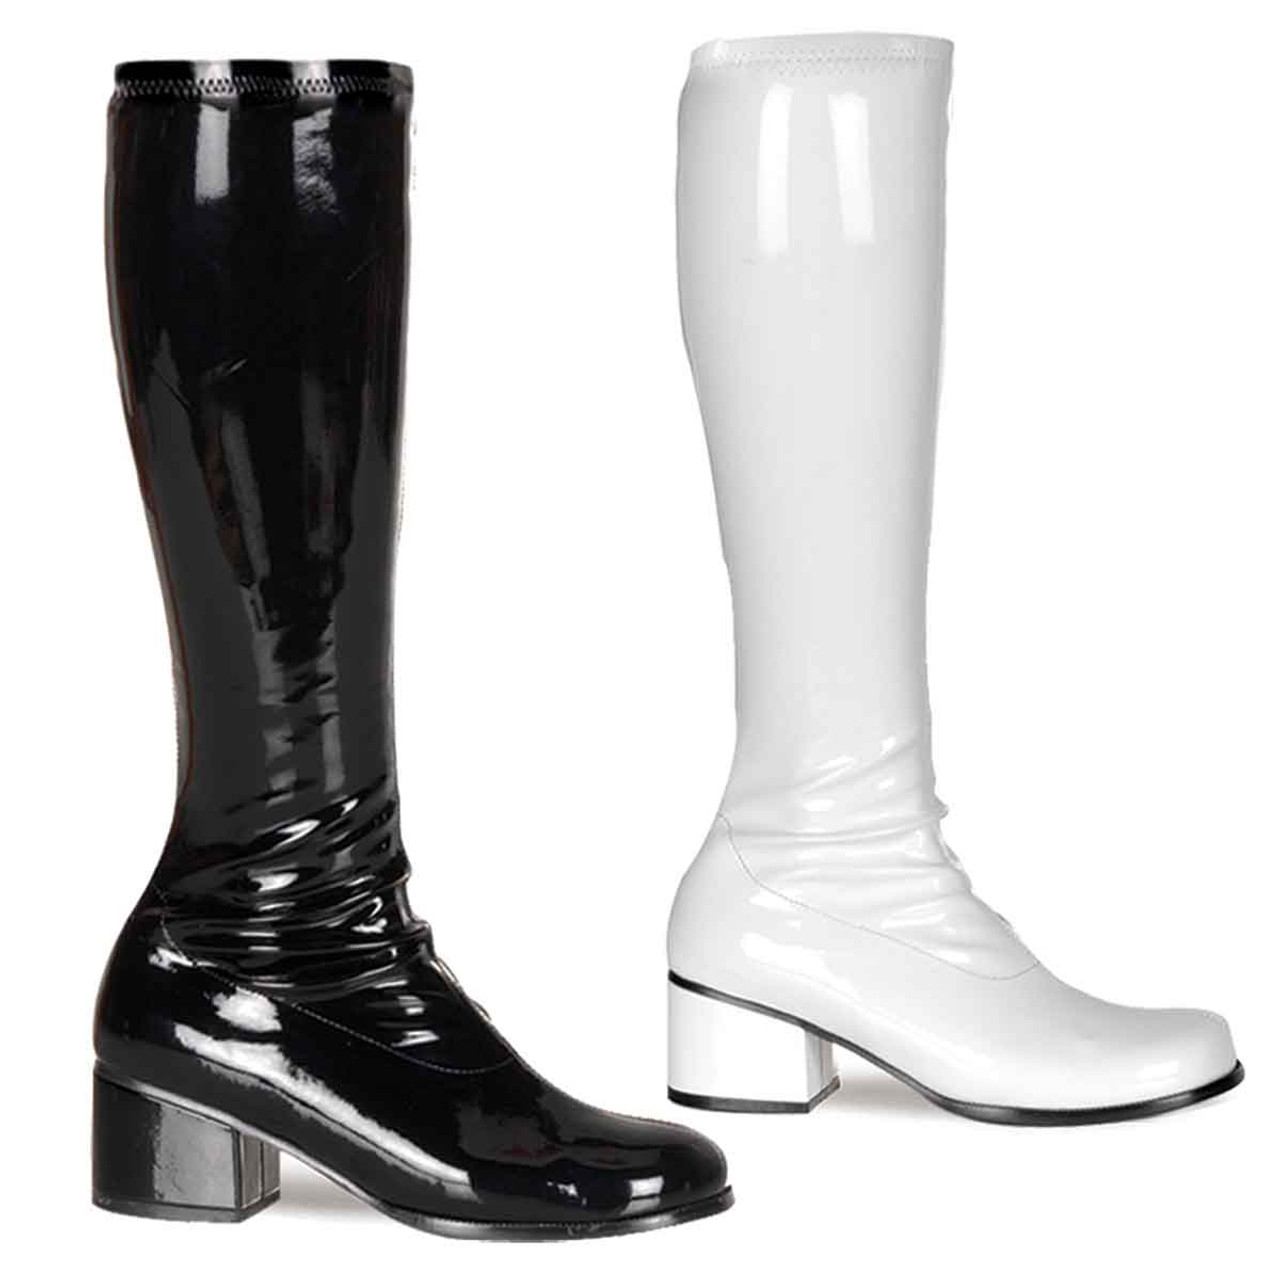 550ca27a65f Retro-300, 2 Inch Go Go Boots | Funtasma